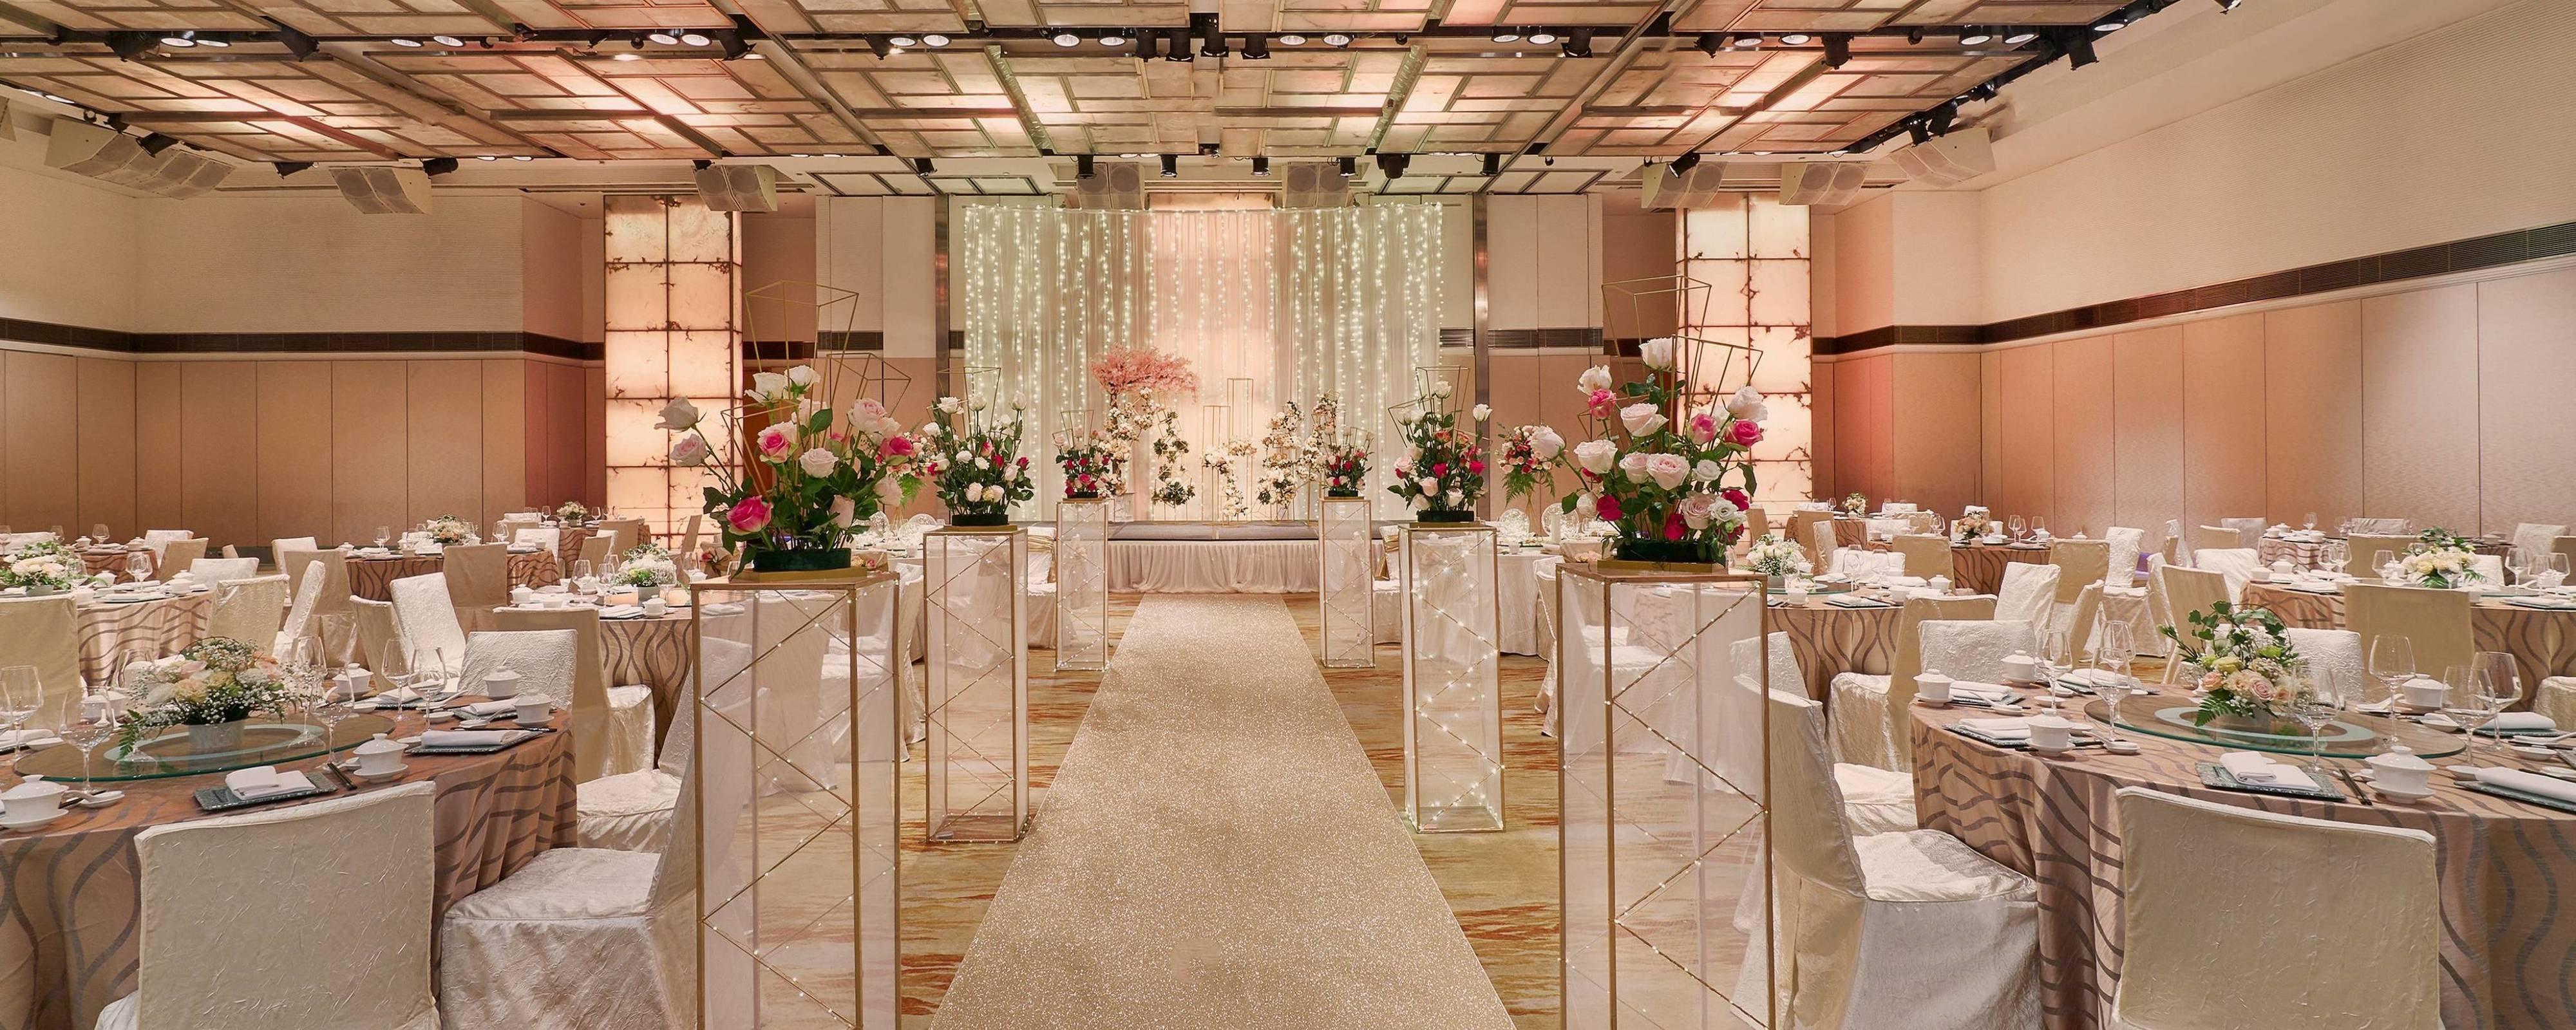 Singapore Wedding Halls Locations Planners Singapore